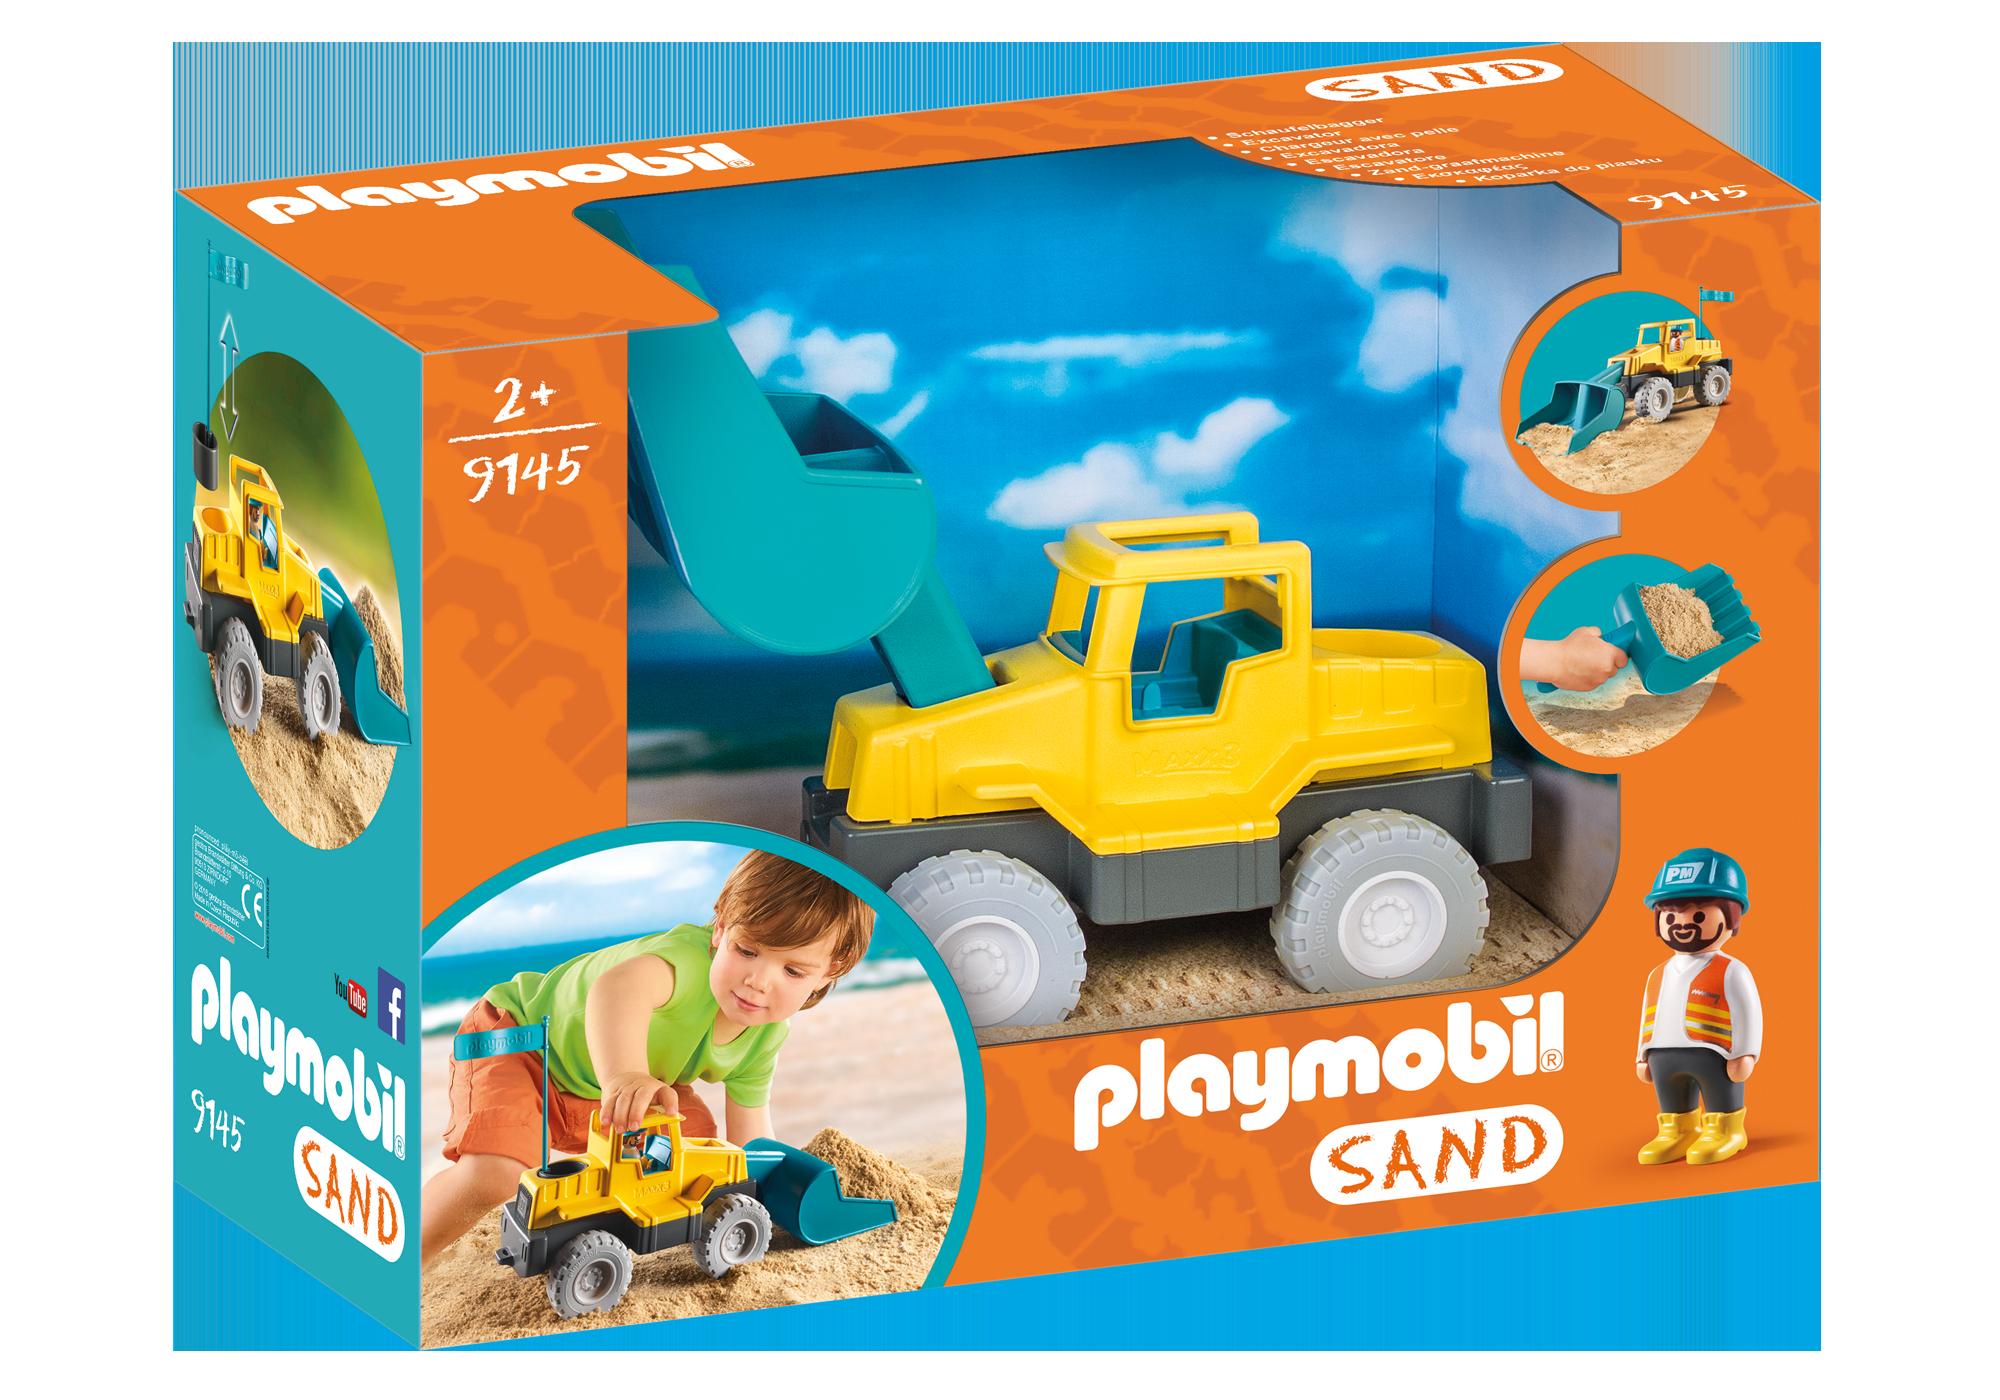 http://media.playmobil.com/i/playmobil/9145_product_box_front/Excavator